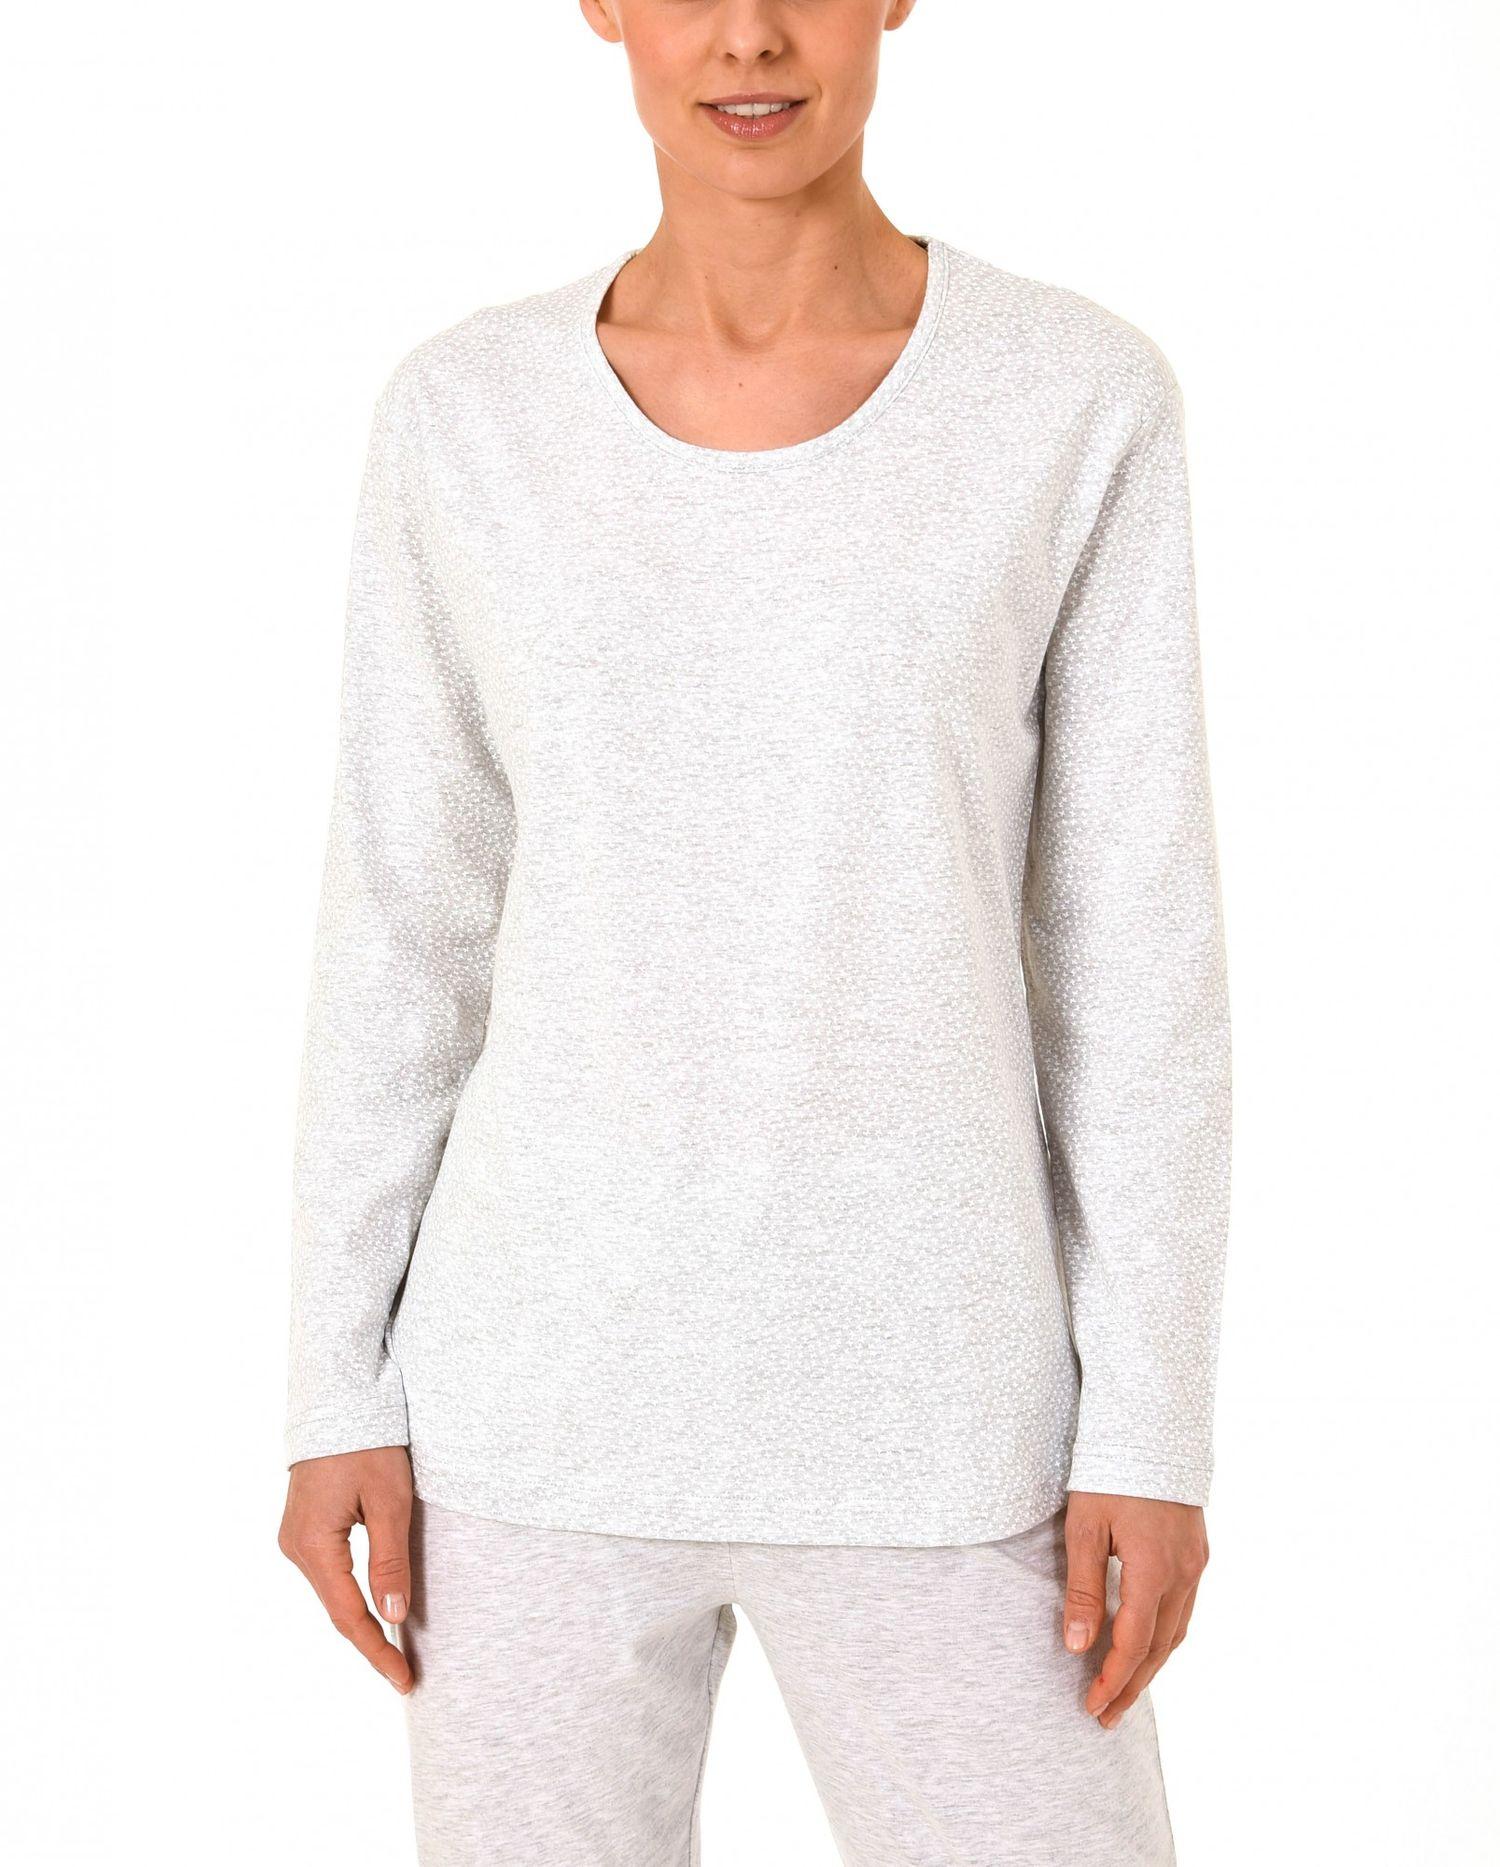 Damen Shirt  Oberteil - langarm Mix & Match Minimalprint – 171 219 90 904 – Bild 3